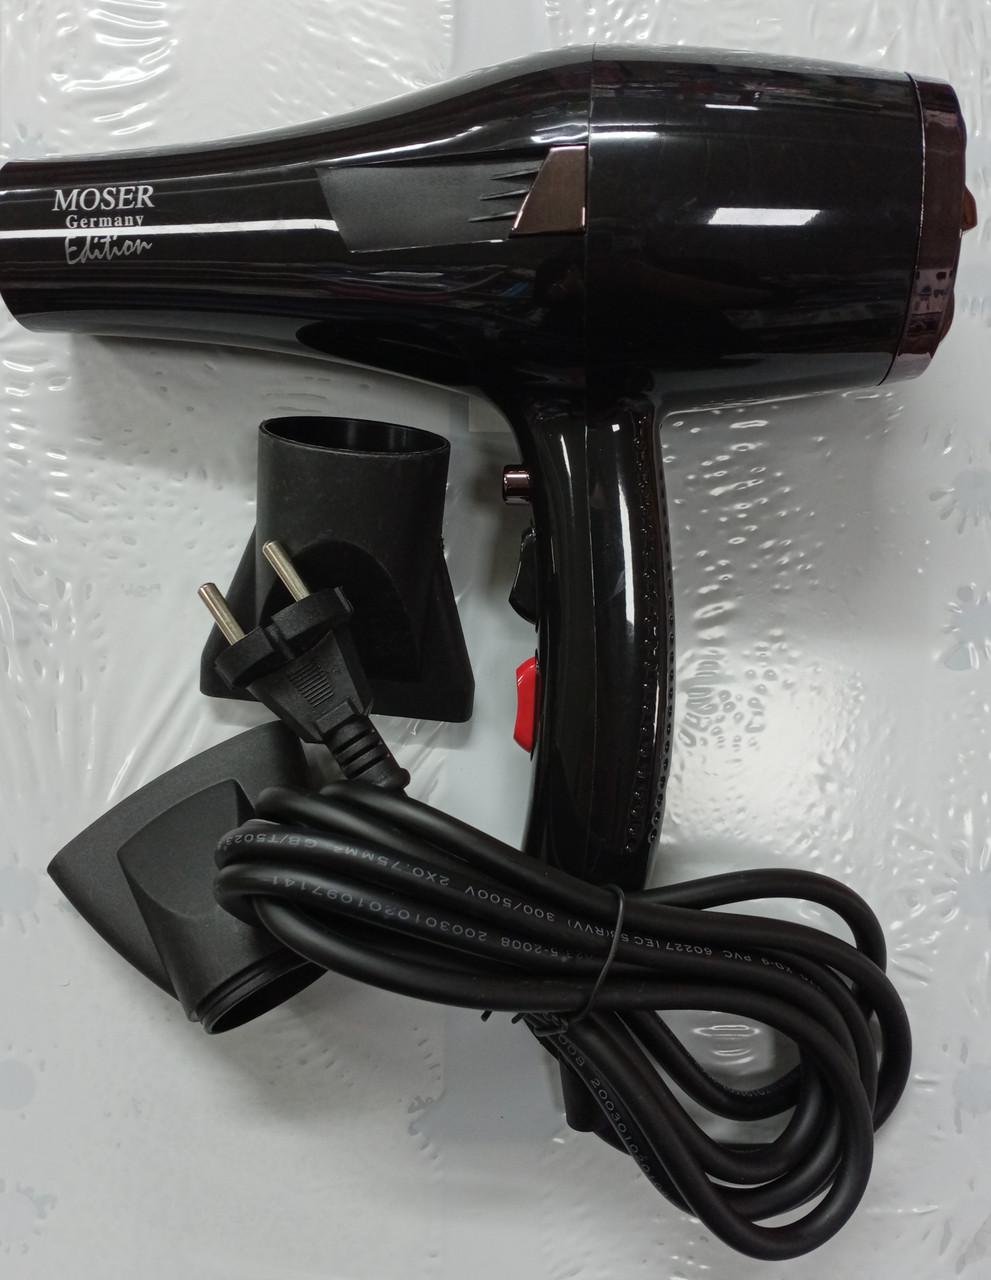 Фен для волос Moser 9930 (7000 Ватт)